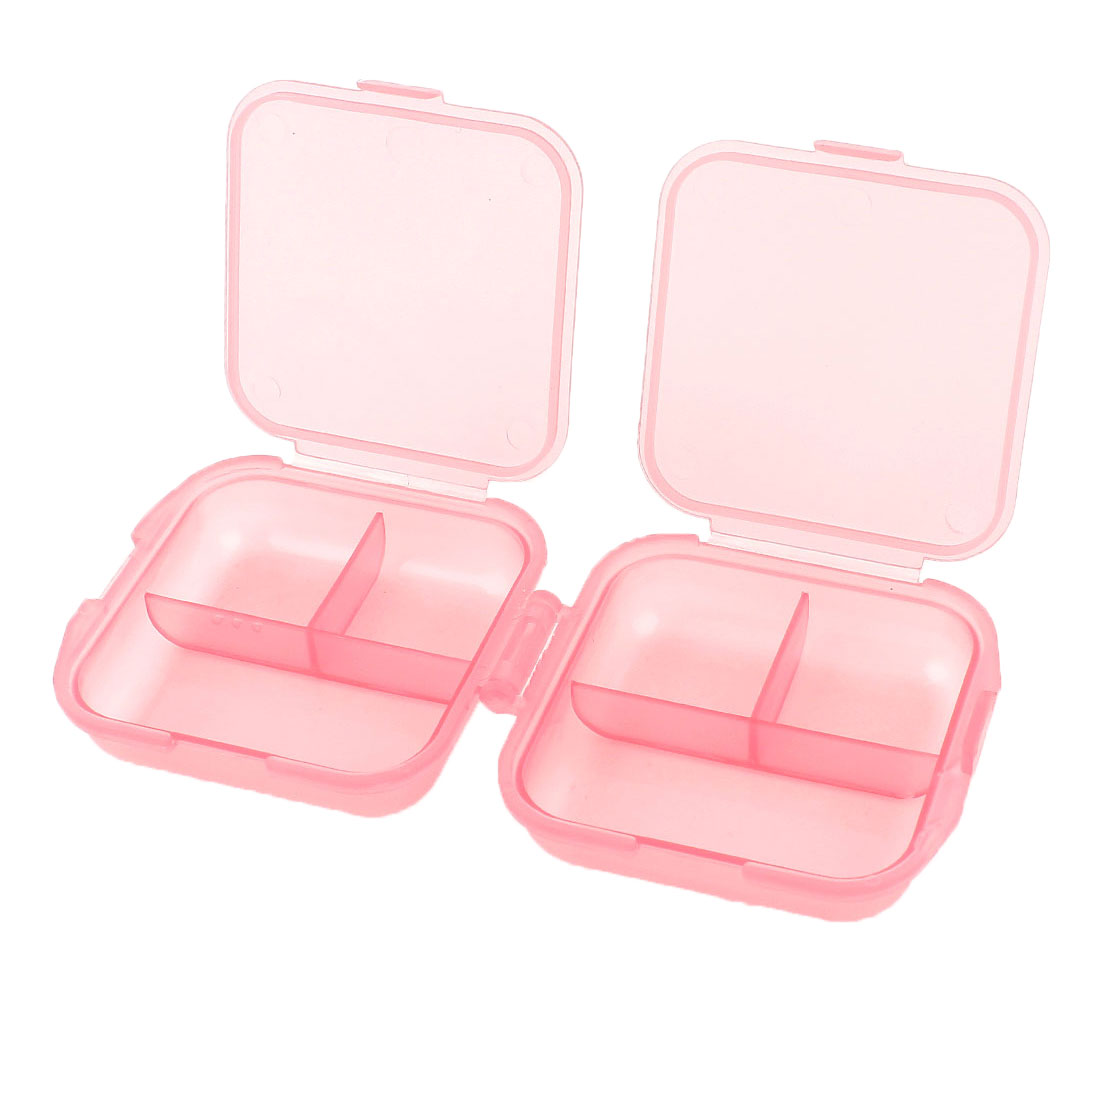 Unique Bargains Portable 6 Cells Pink Plastic Mini Pill Box Storage Case Holder